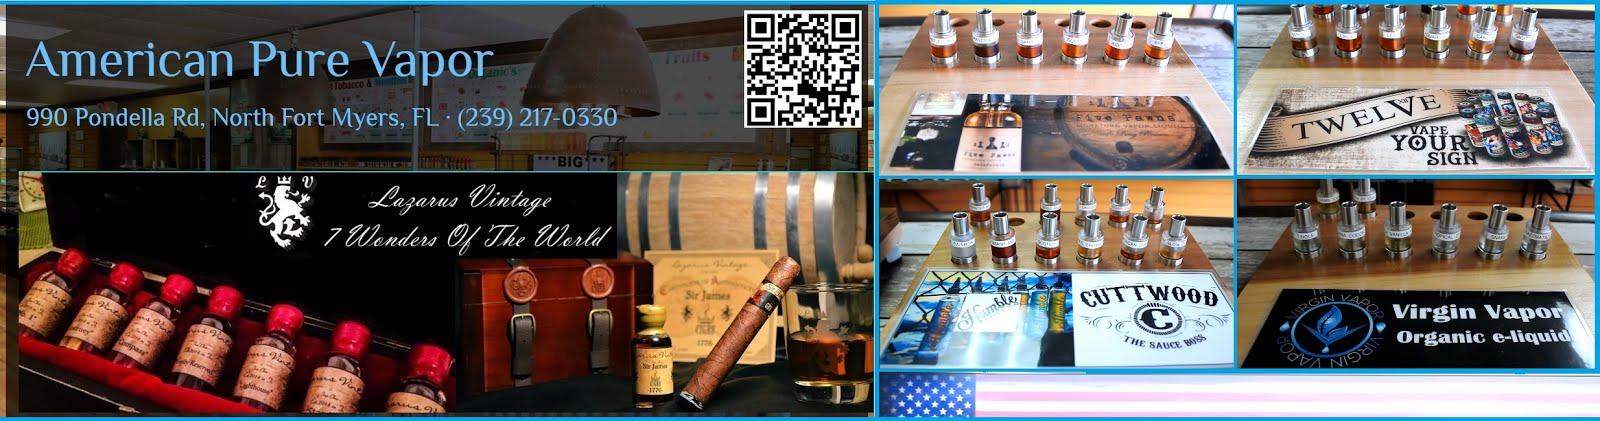 American Pure Vapor 990 Pondella Rd, North Fort Myers, FL 33903 (239) 217-0330